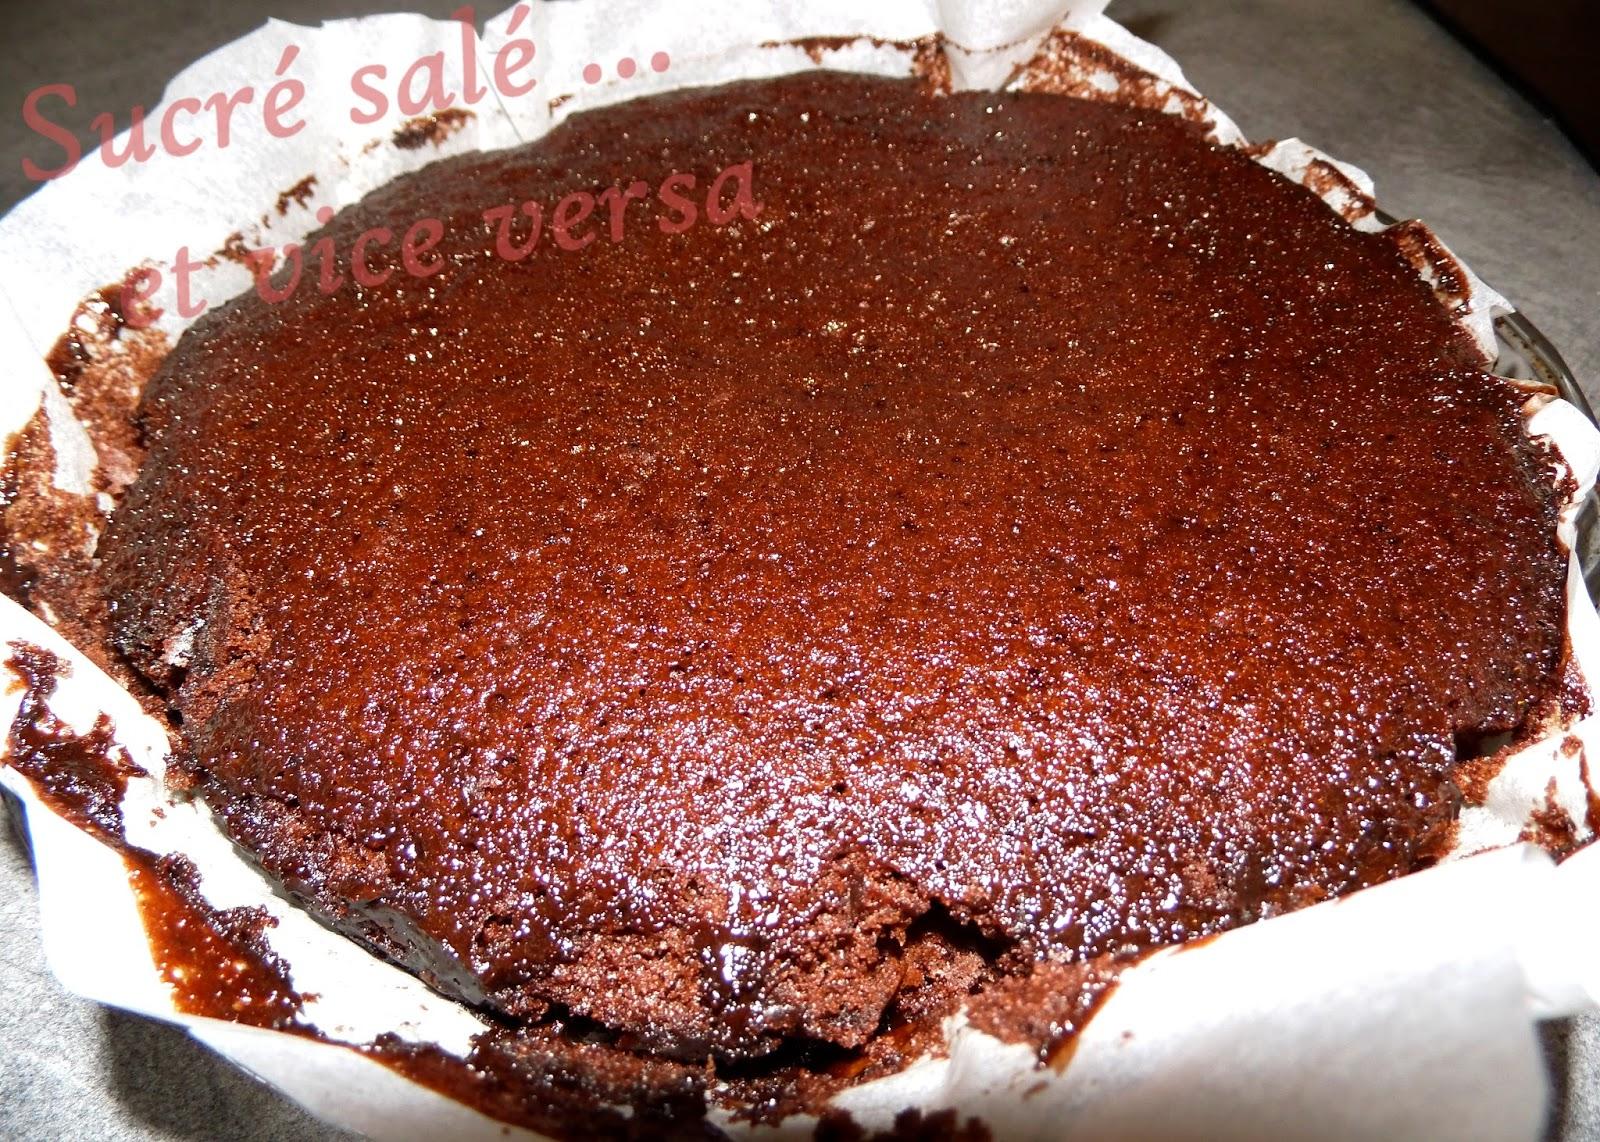 Simplissime Cake Sal Ef Bf Bd